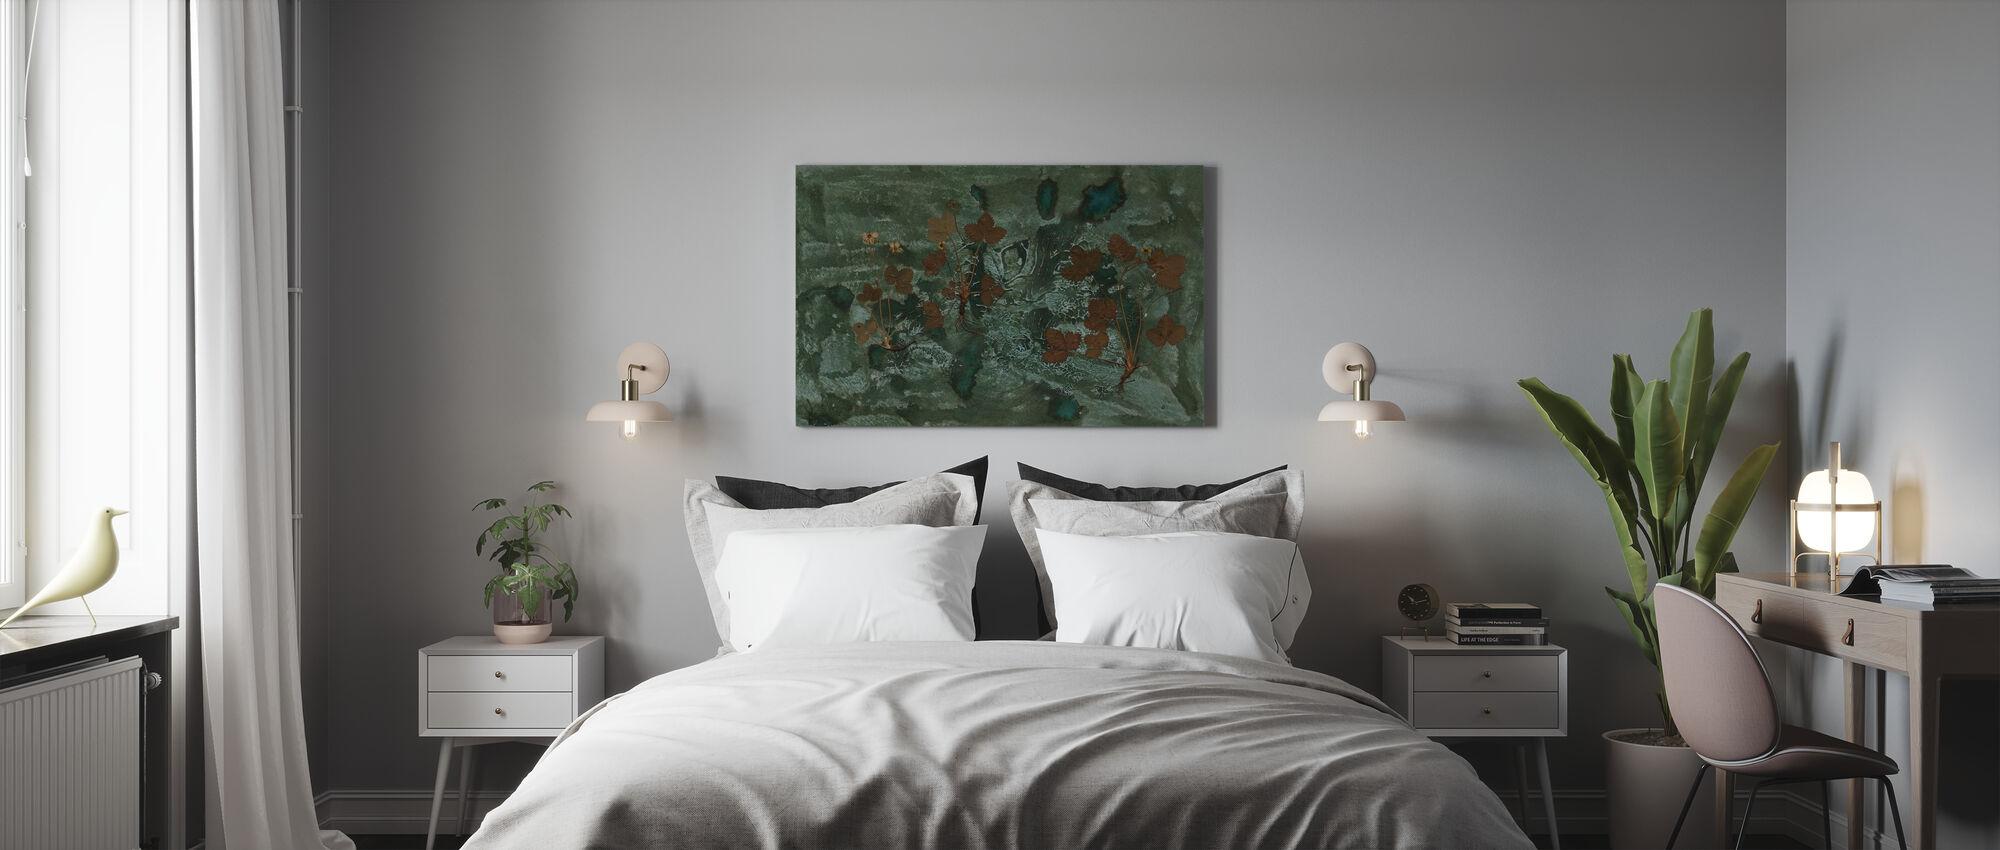 Bibi - Leinwandbild - Schlafzimmer